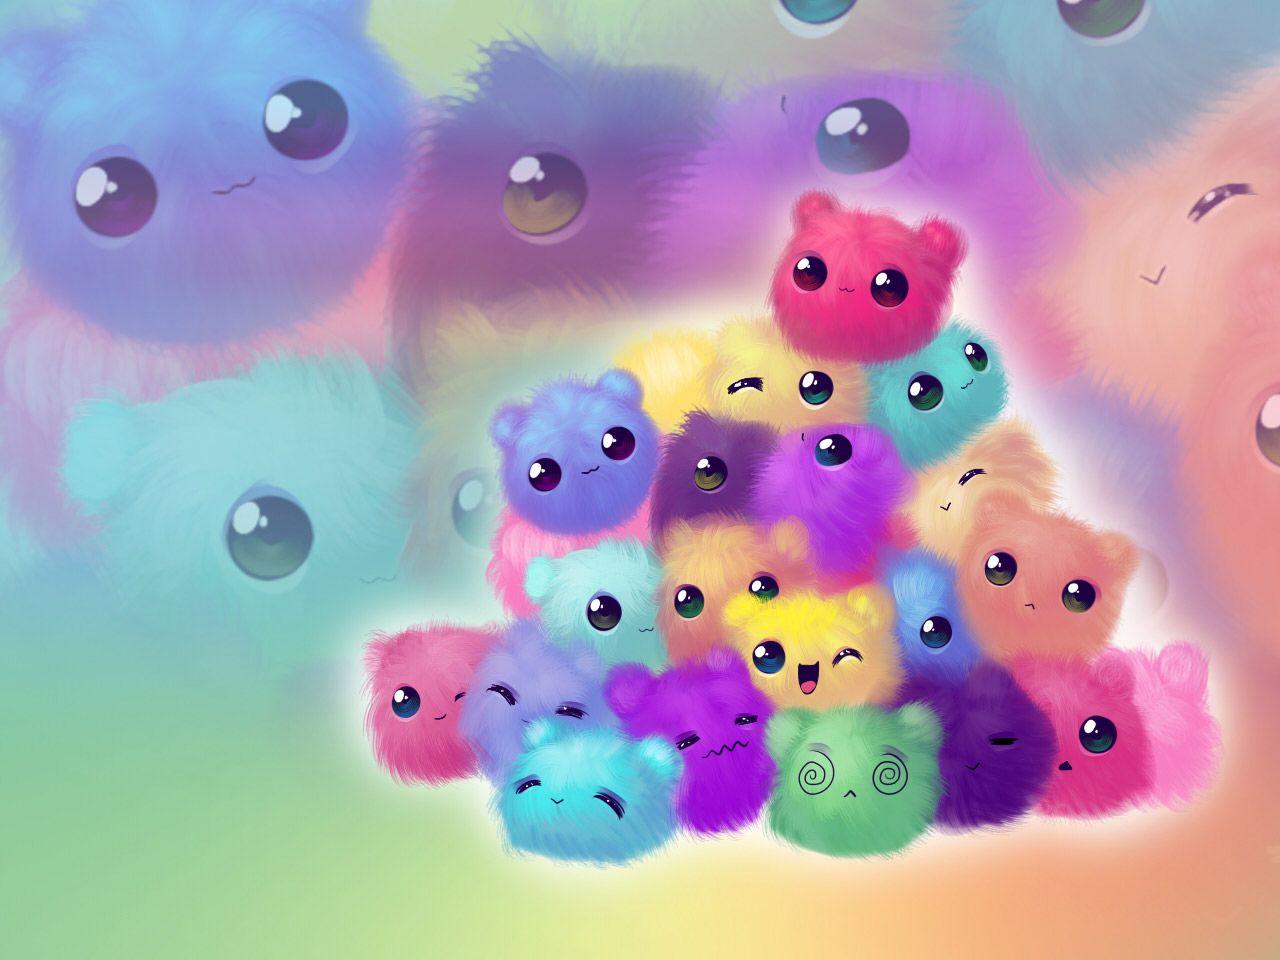 Adorable cute fluffies Cute wallpapers Kawaii wallpaper Anime 1280x960